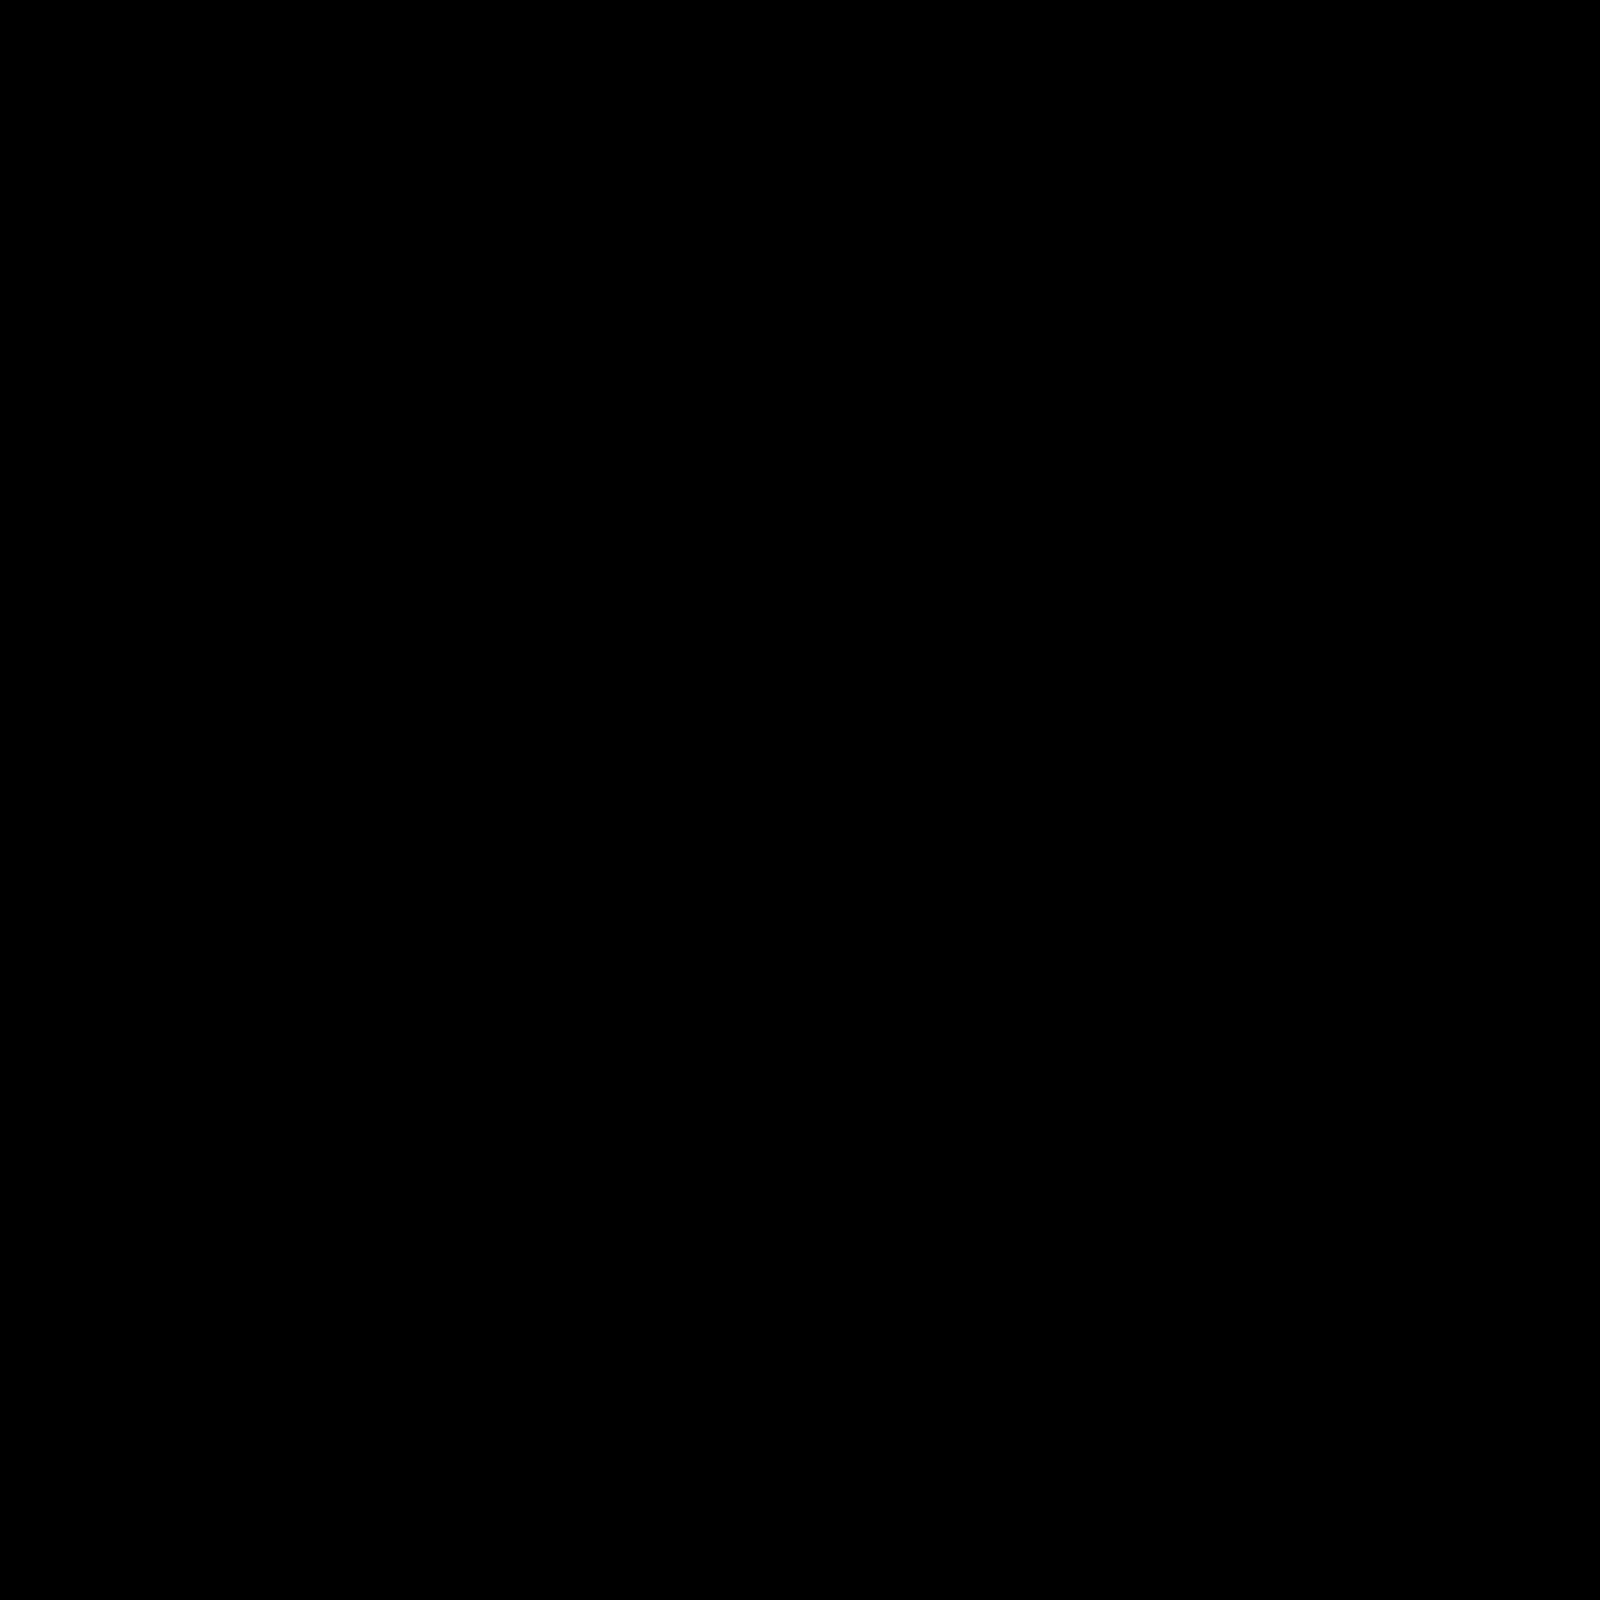 symbol Księżyca icon